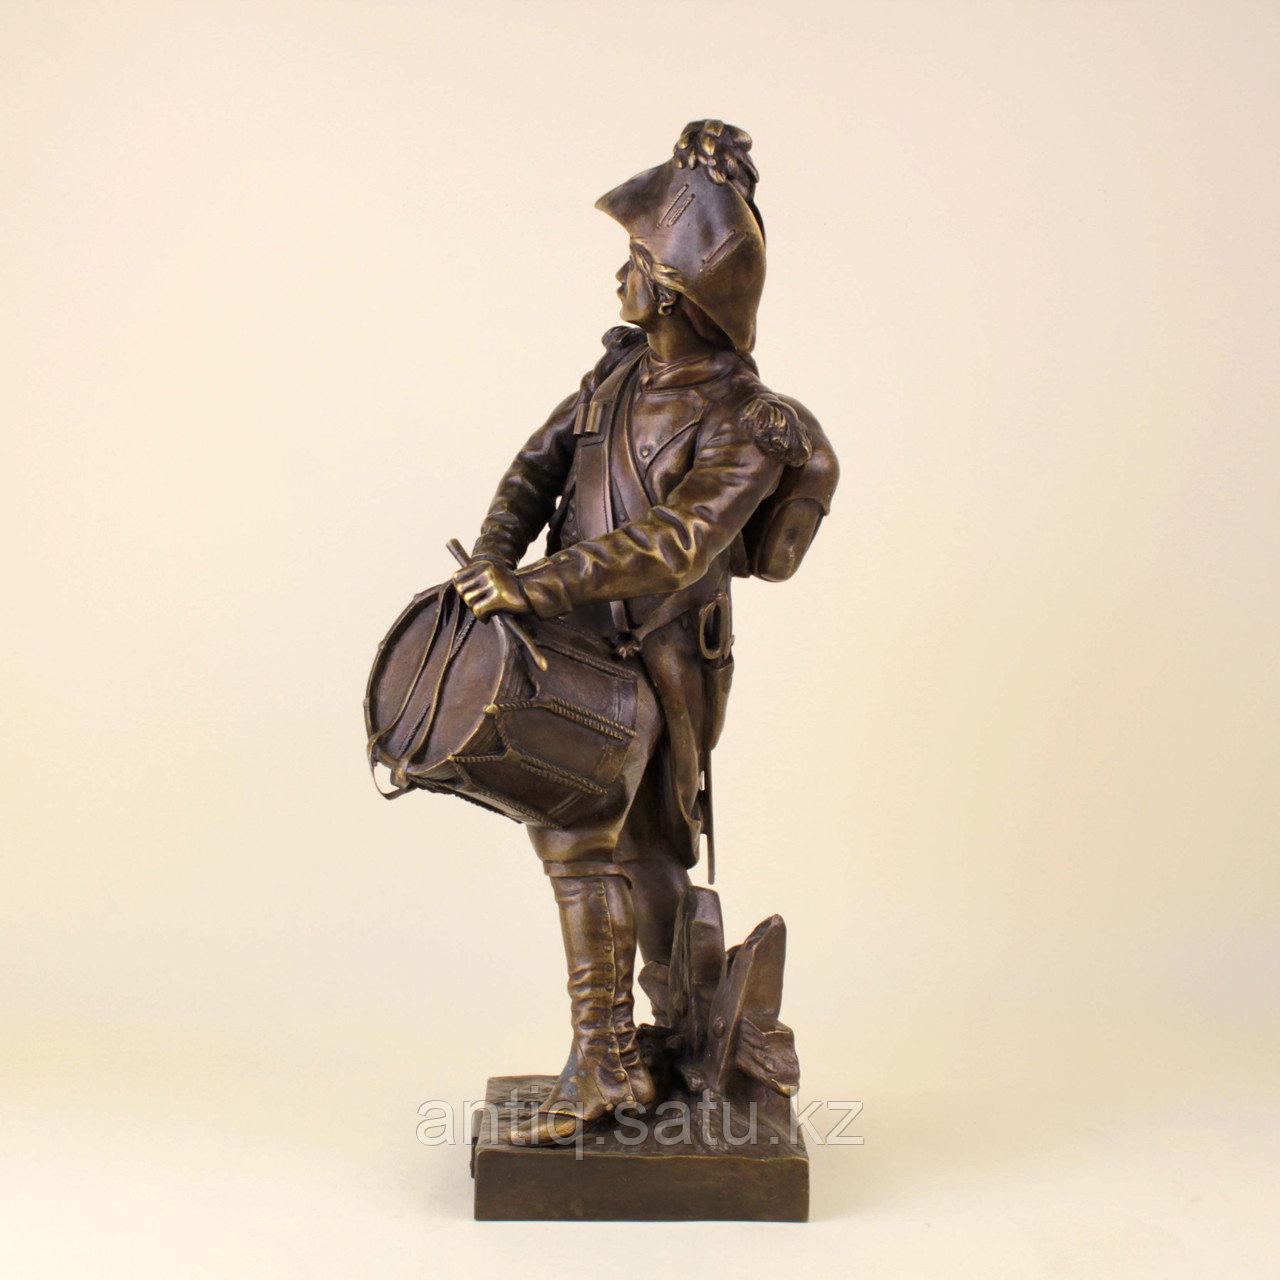 Барабанщик. Автор Etienne Henri Dumaige (1830-1888) - фото 2